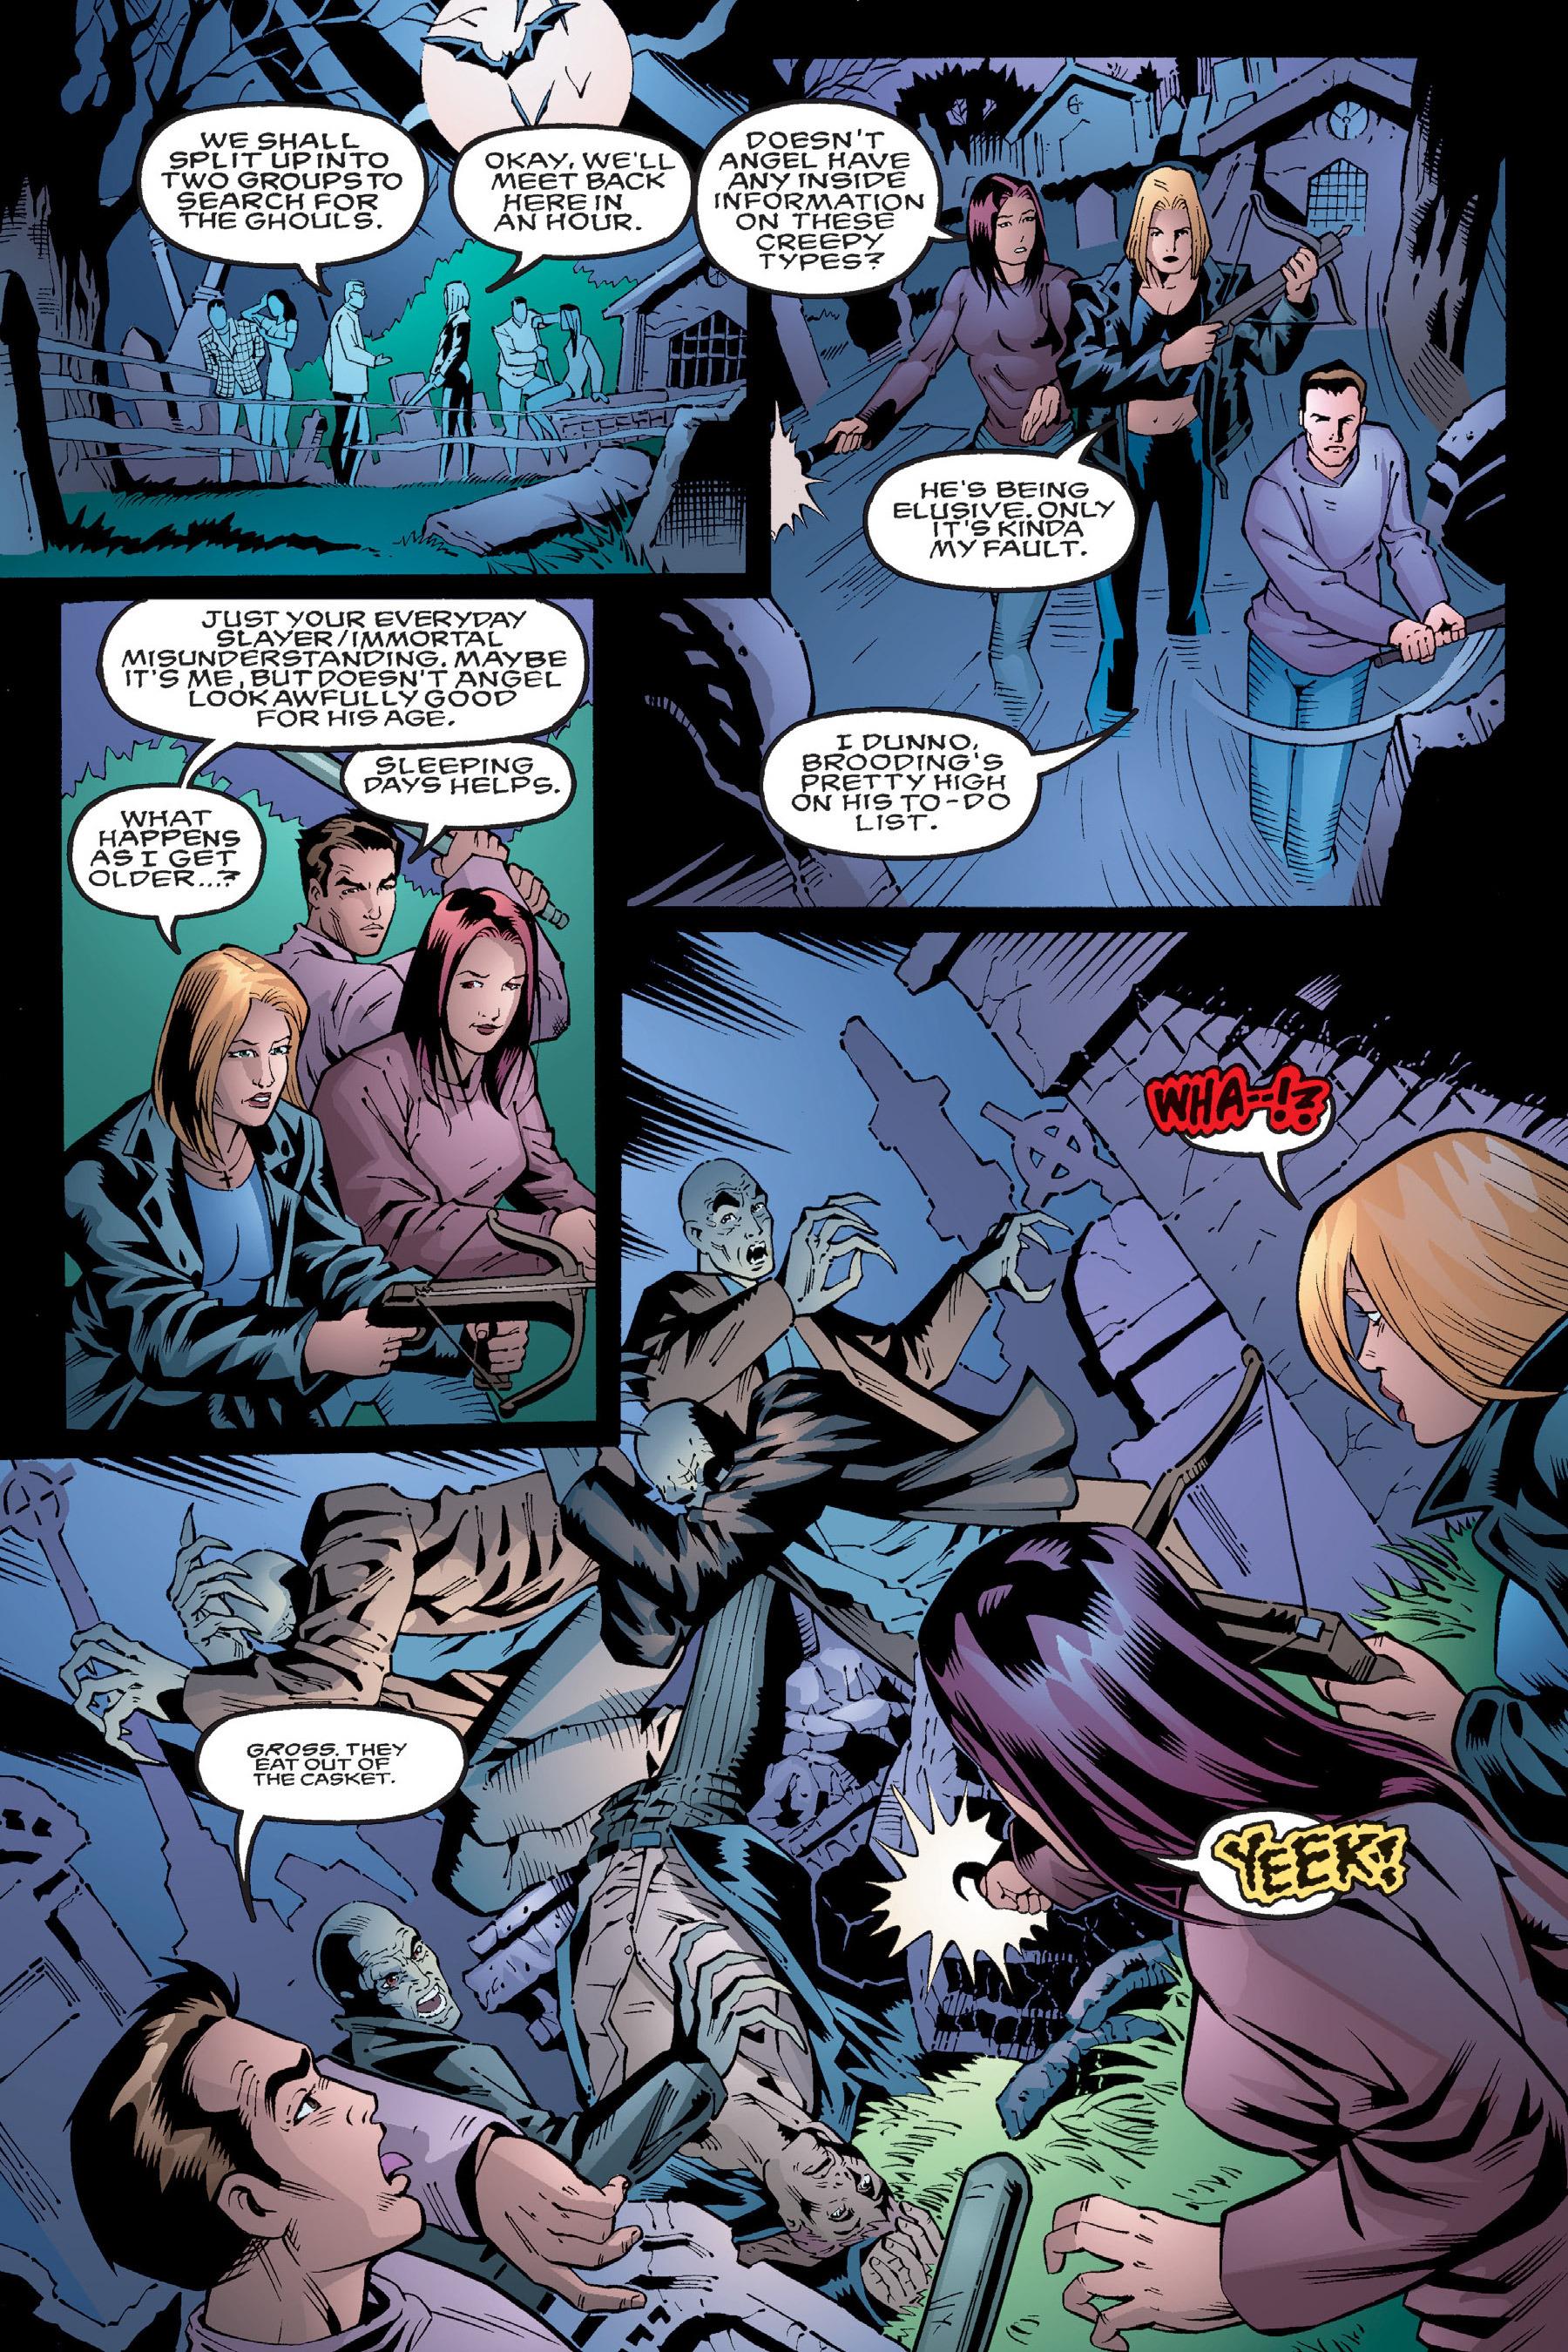 Read online Buffy the Vampire Slayer: Omnibus comic -  Issue # TPB 4 - 41